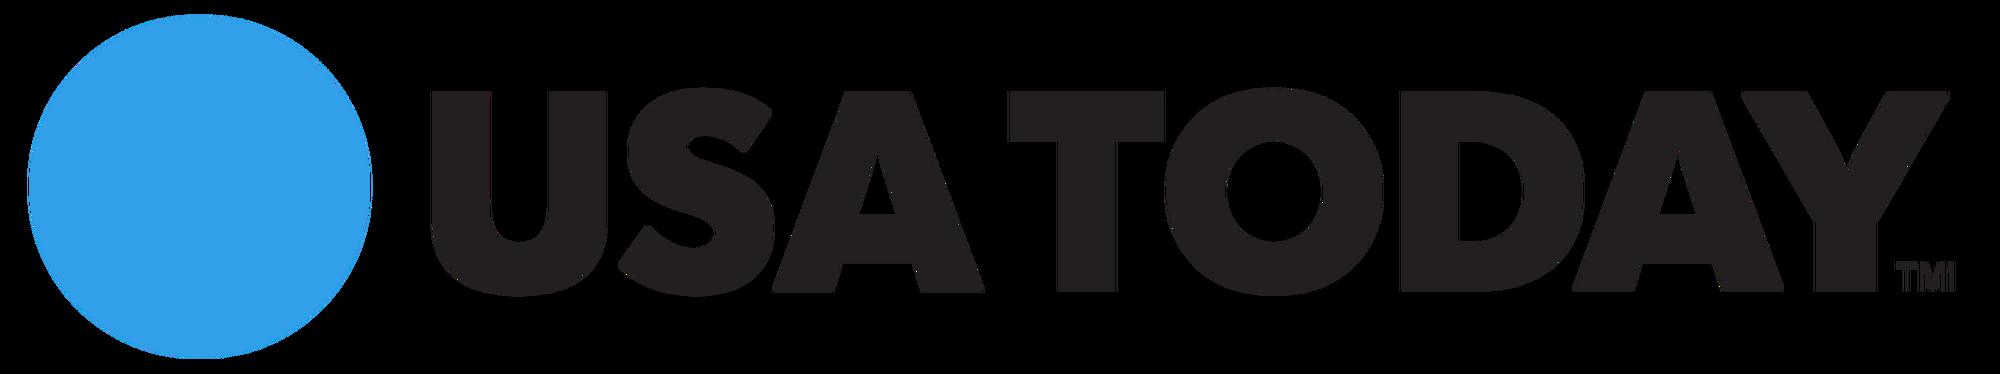 USA Today - Logos Download